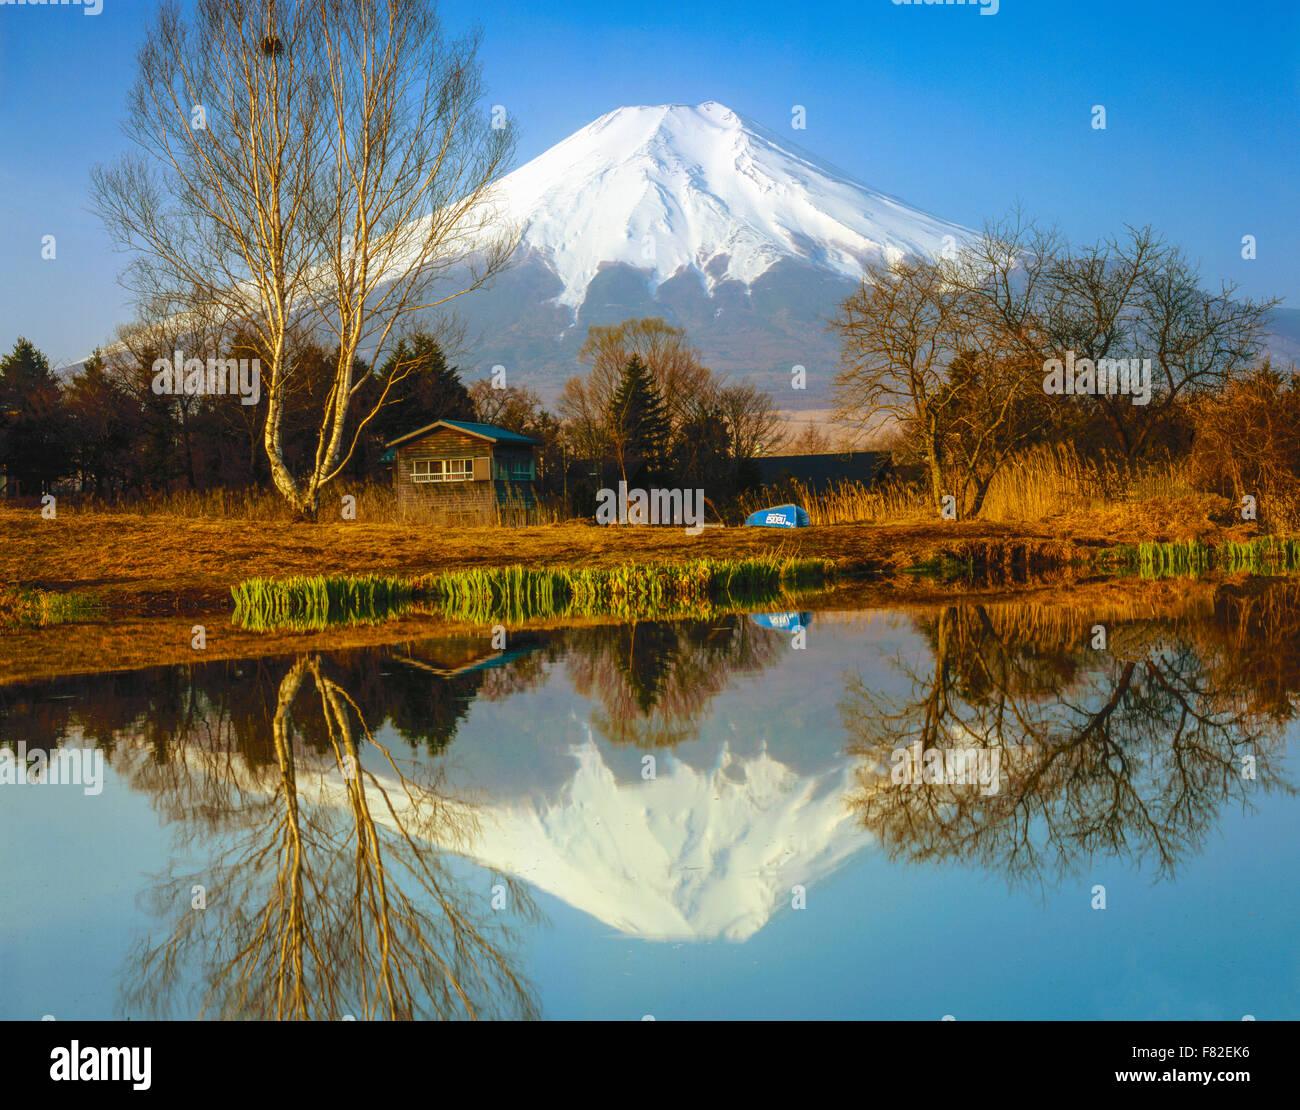 Mt. Fuji reflection, Fuji-Hazone-Izu National park, Japan 12, 388 foot dormant volcano, Reflected in Tsurga Ponds/Oshino - Stock Image